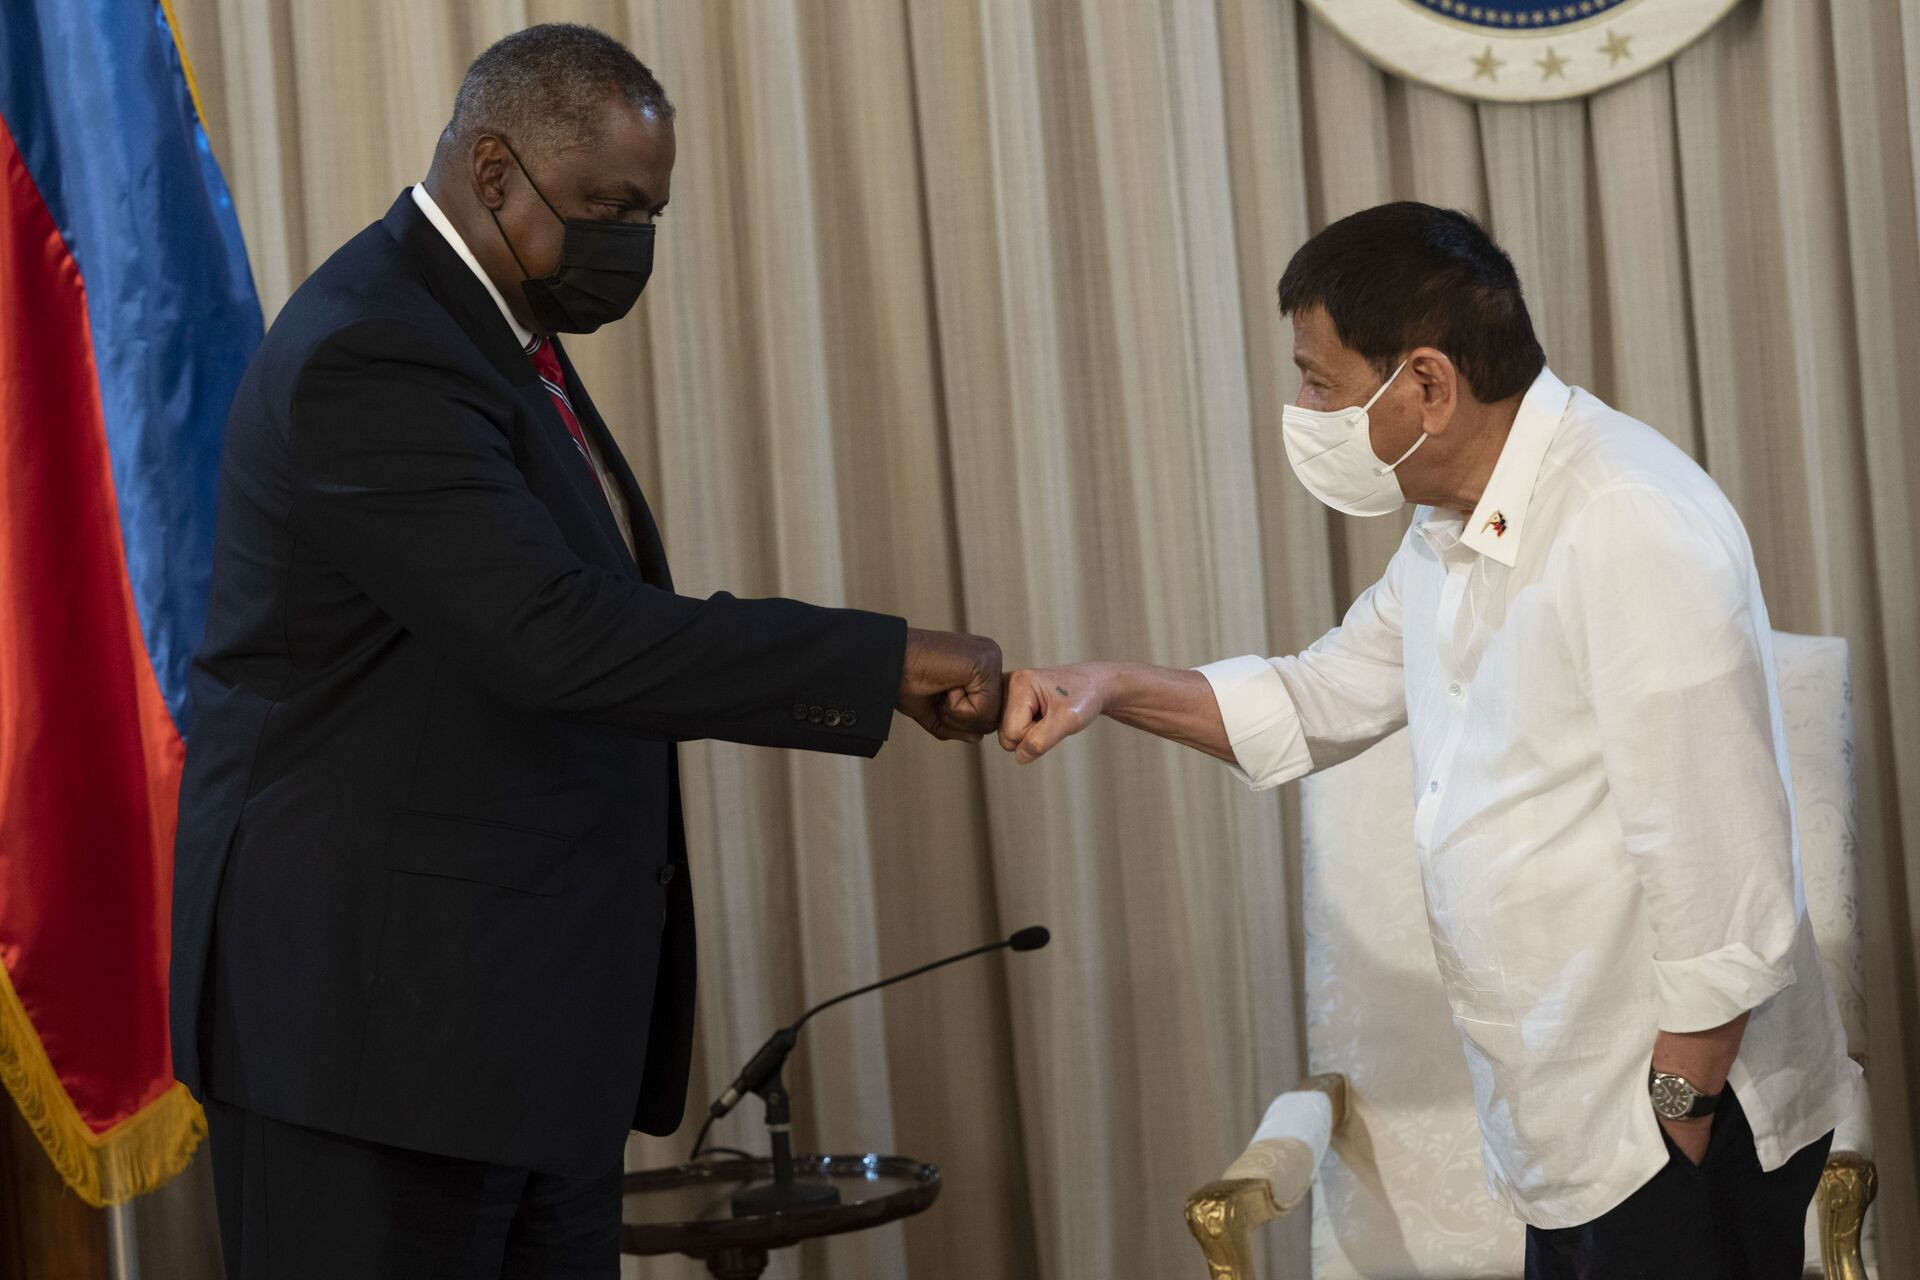 Secretary of Defense Lloyd J. Austin III meets with Philippine President Rodrigo Duterte in Manila, July 29, 2021. - Sputnik International, 1920, 07.09.2021